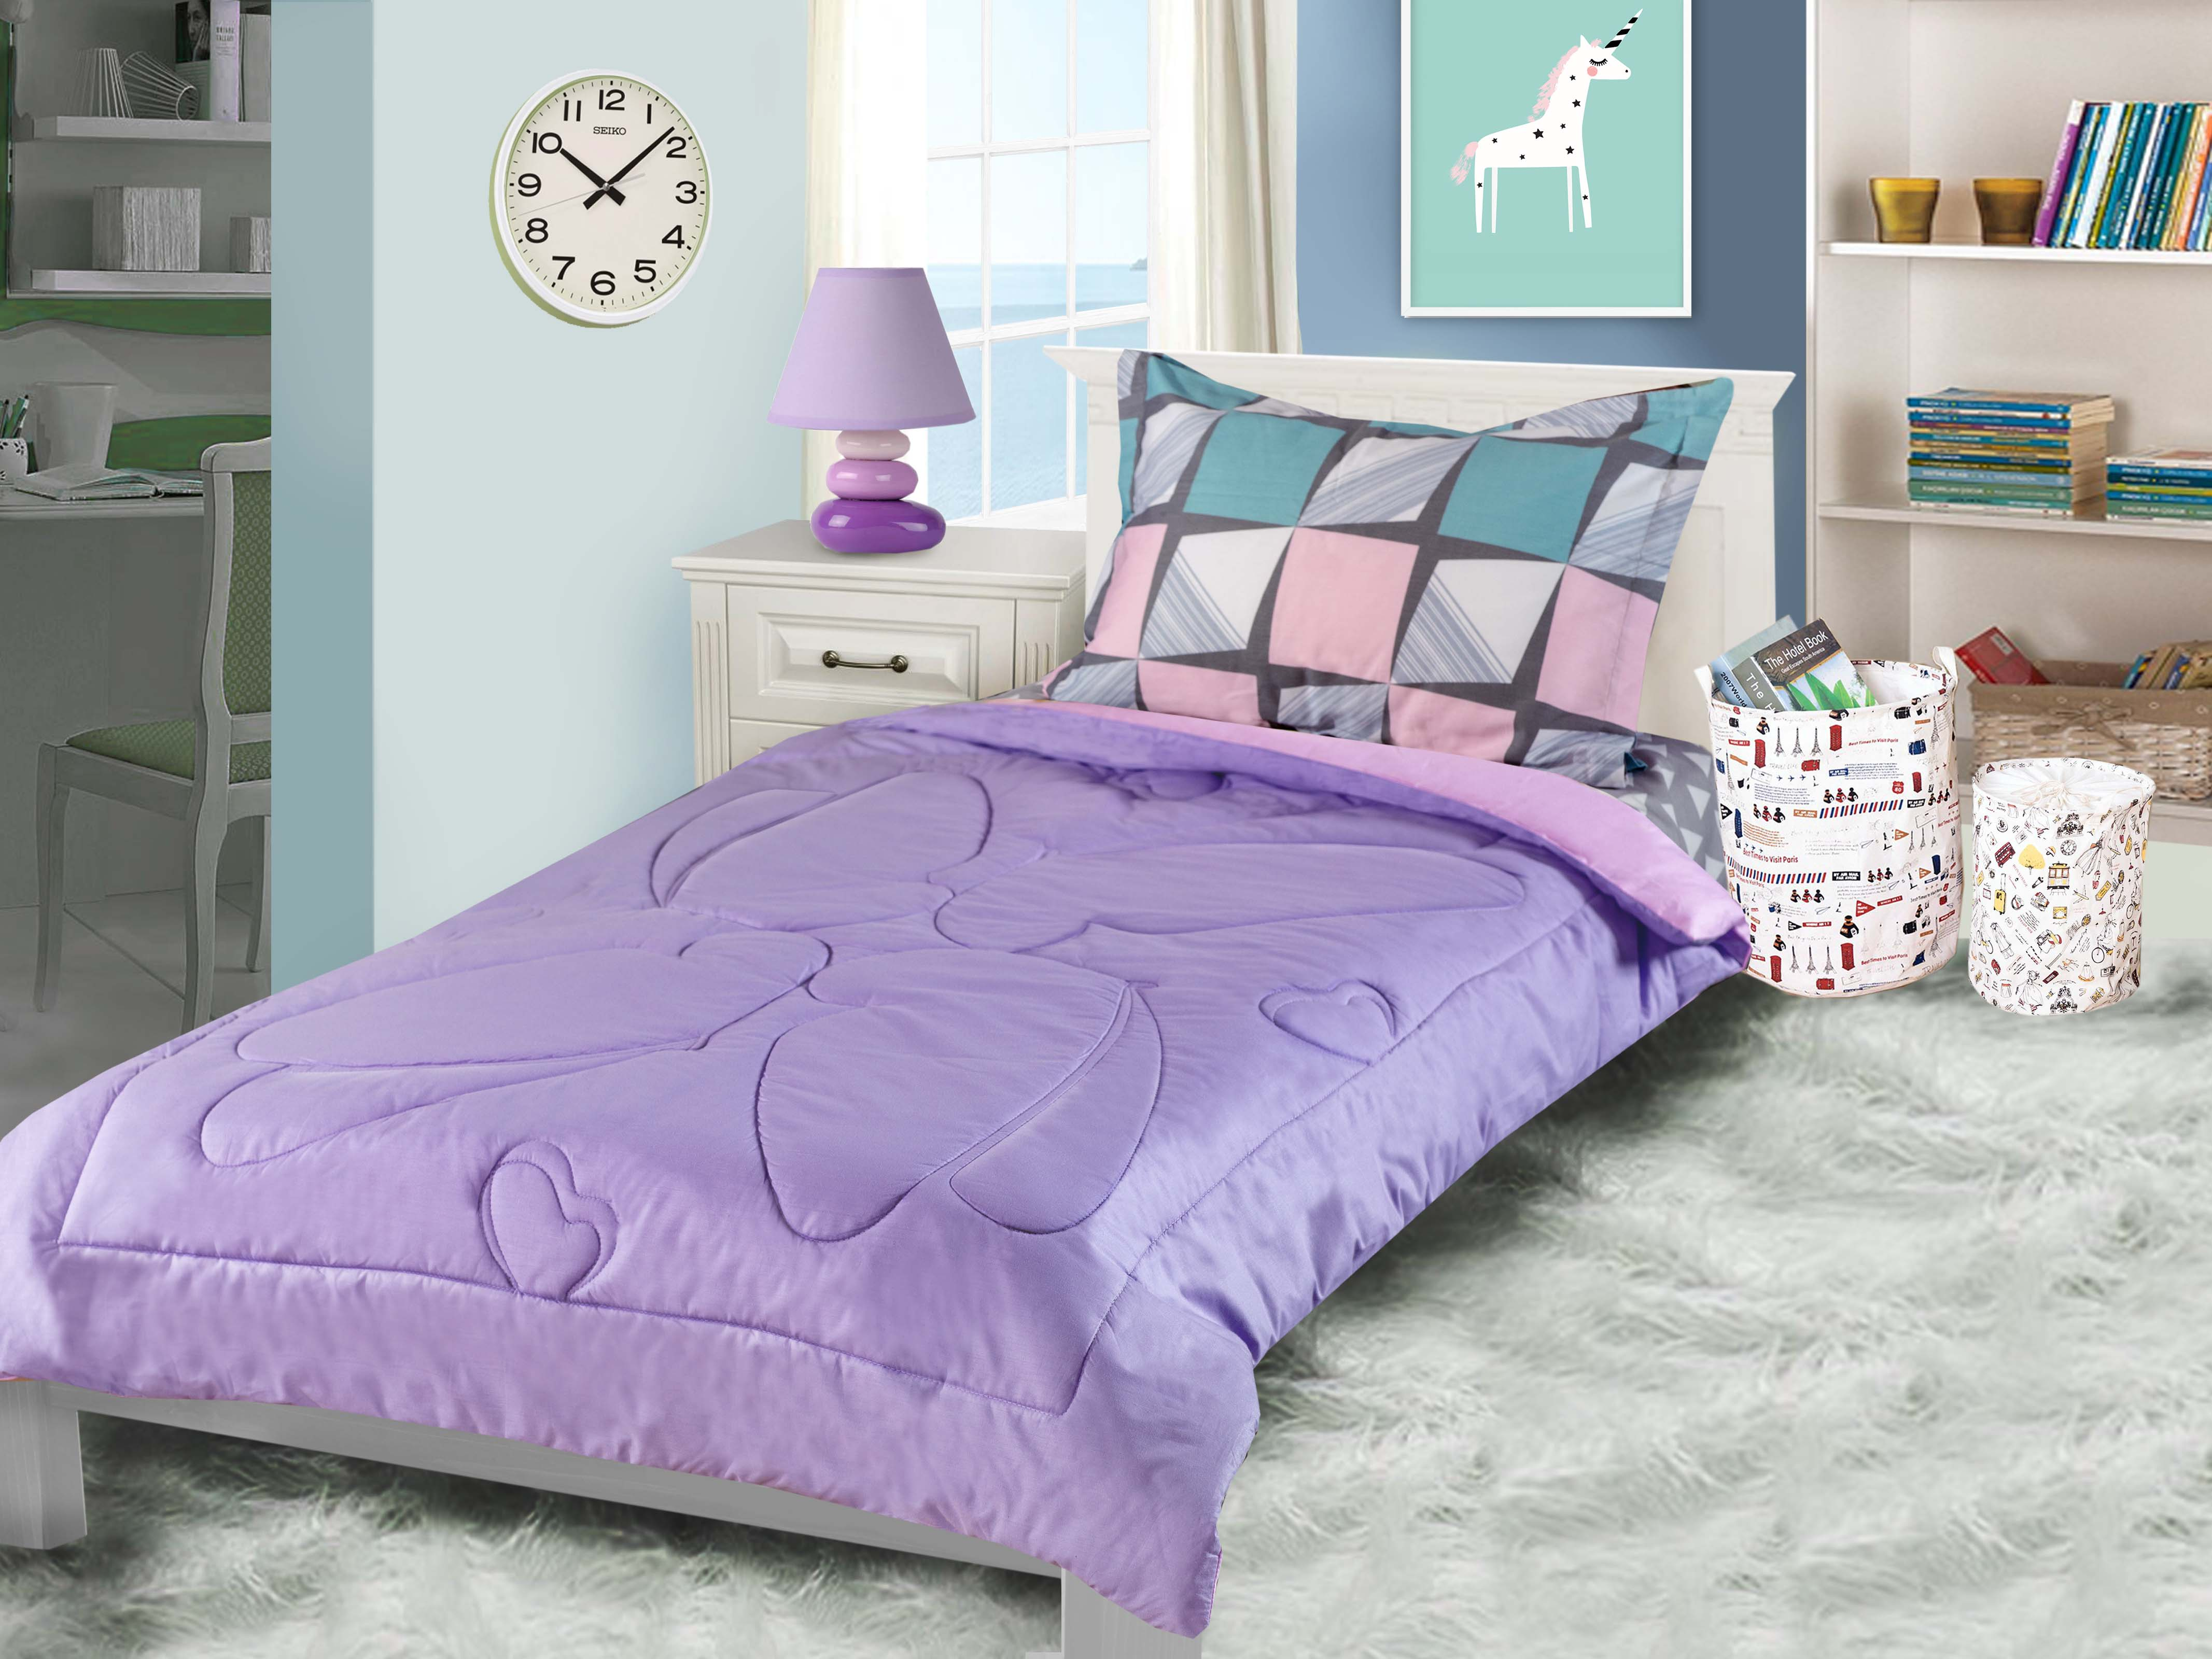 Одеяло детское Primavelle покрывало Primavelle Ummi. Бабочки 110 х 140 см, розовый, сиреневый одеяло primavelle tiziana